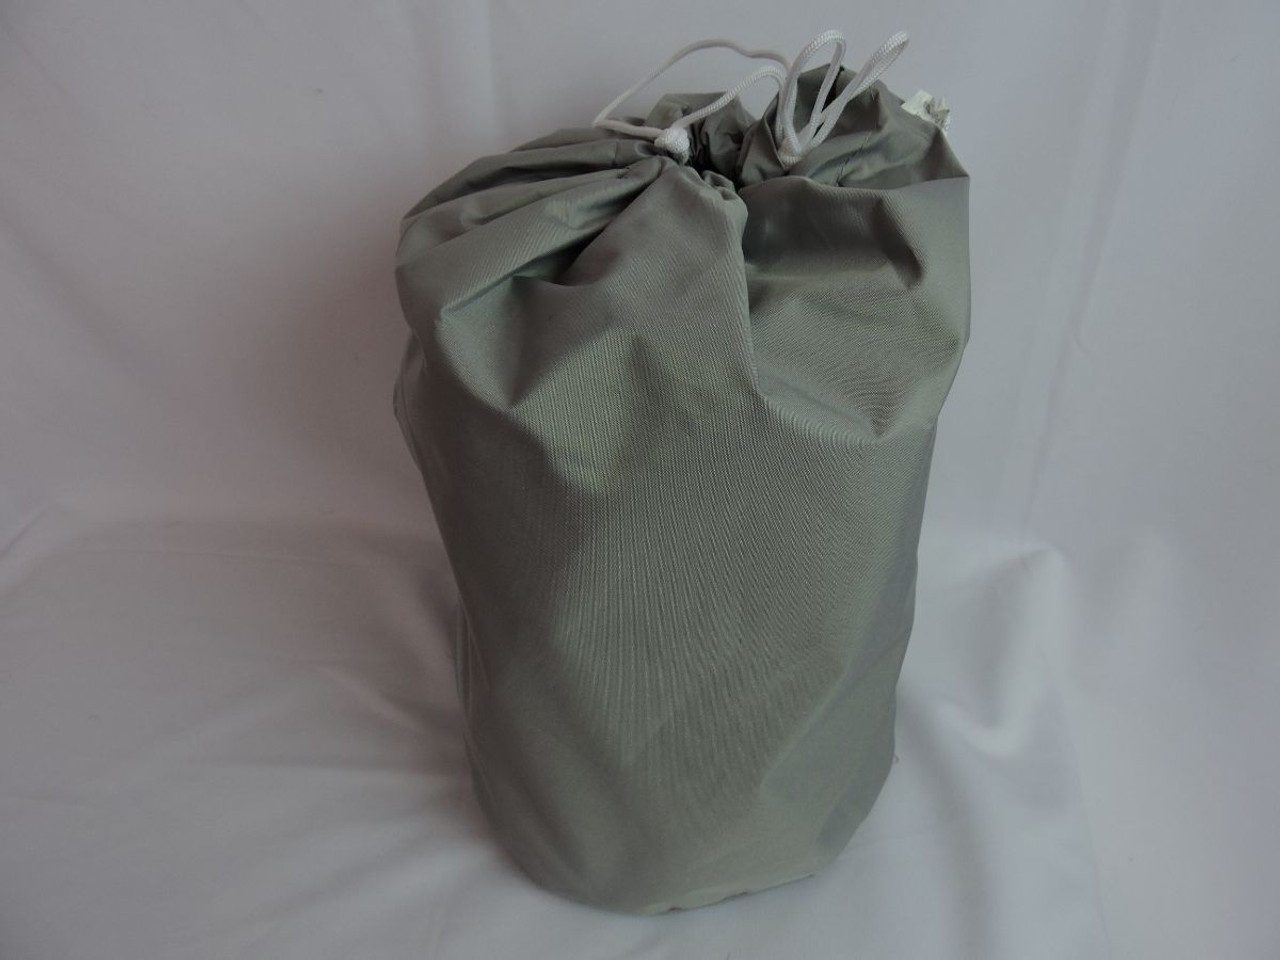 Venture ATV UTV XTV cover storage bag